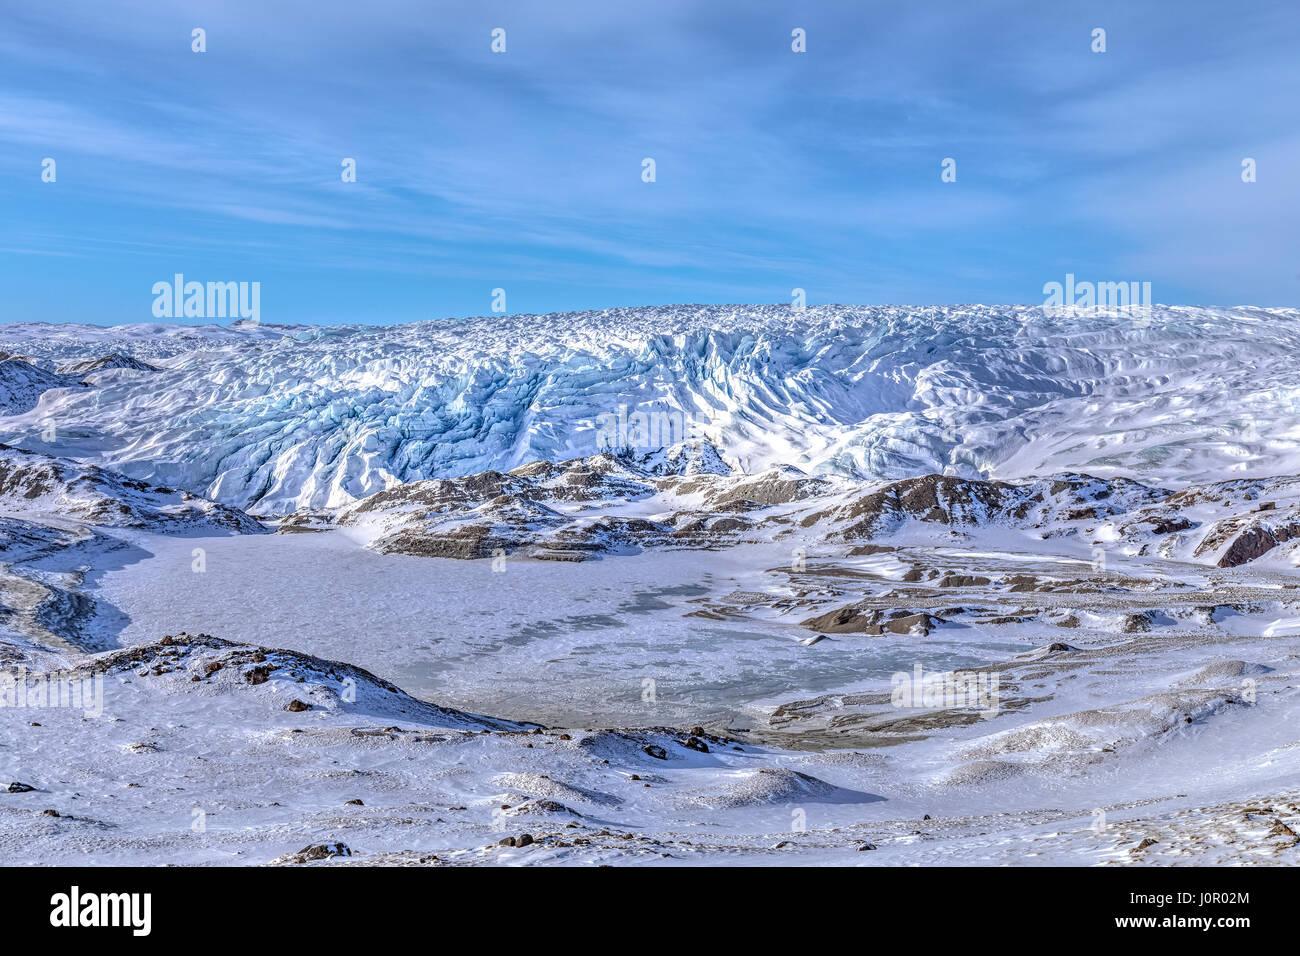 Eis-Kappe, Punkt 660, Kangerlussuaq, Polarkreis, Grönland, Europa Stockbild